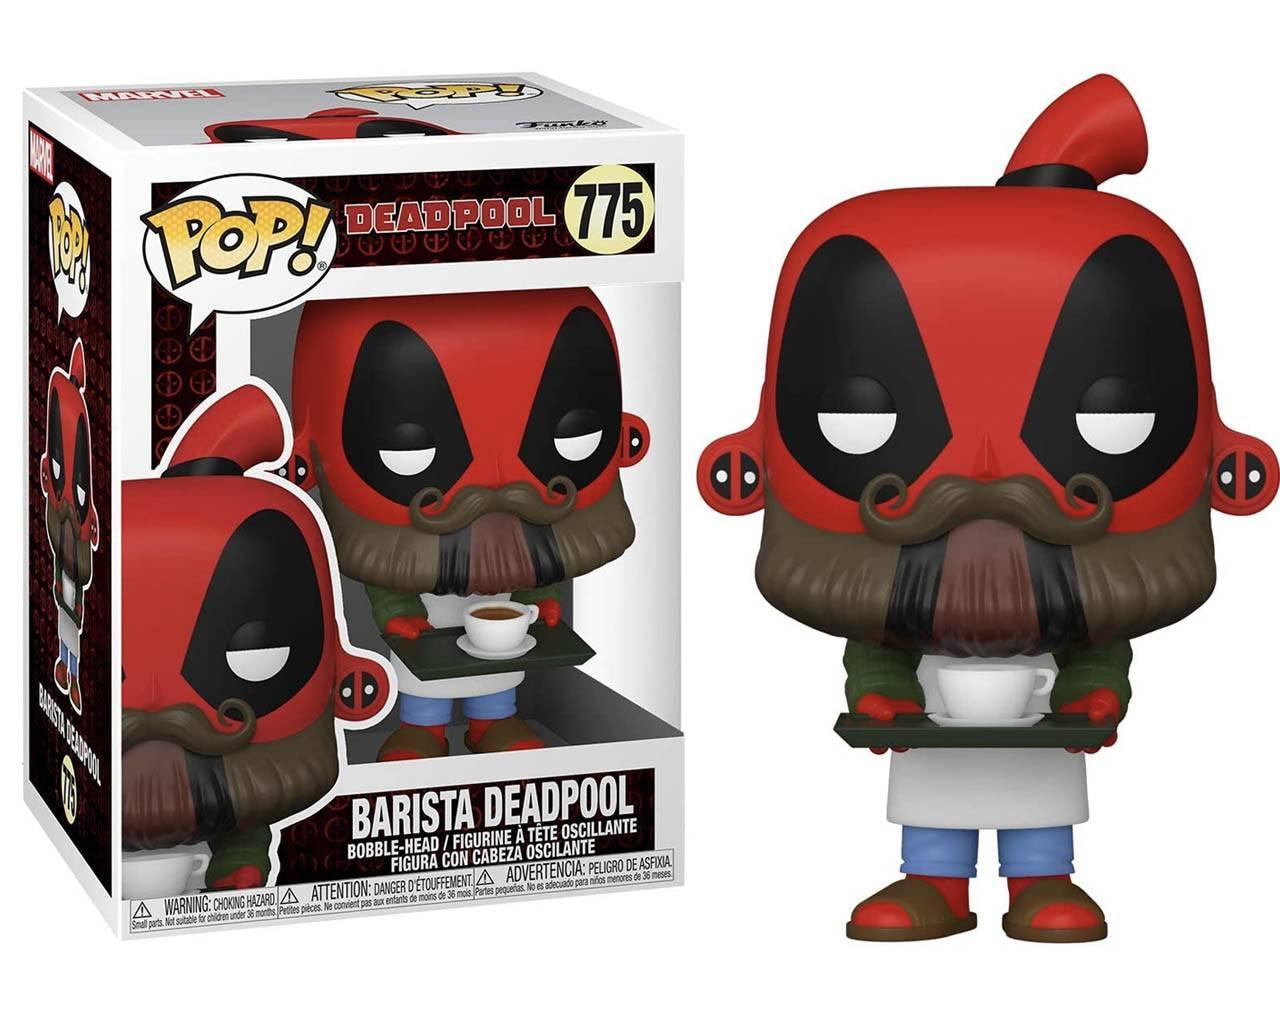 Barista Deadpool (30th Anniversary) Pop! Vinyl